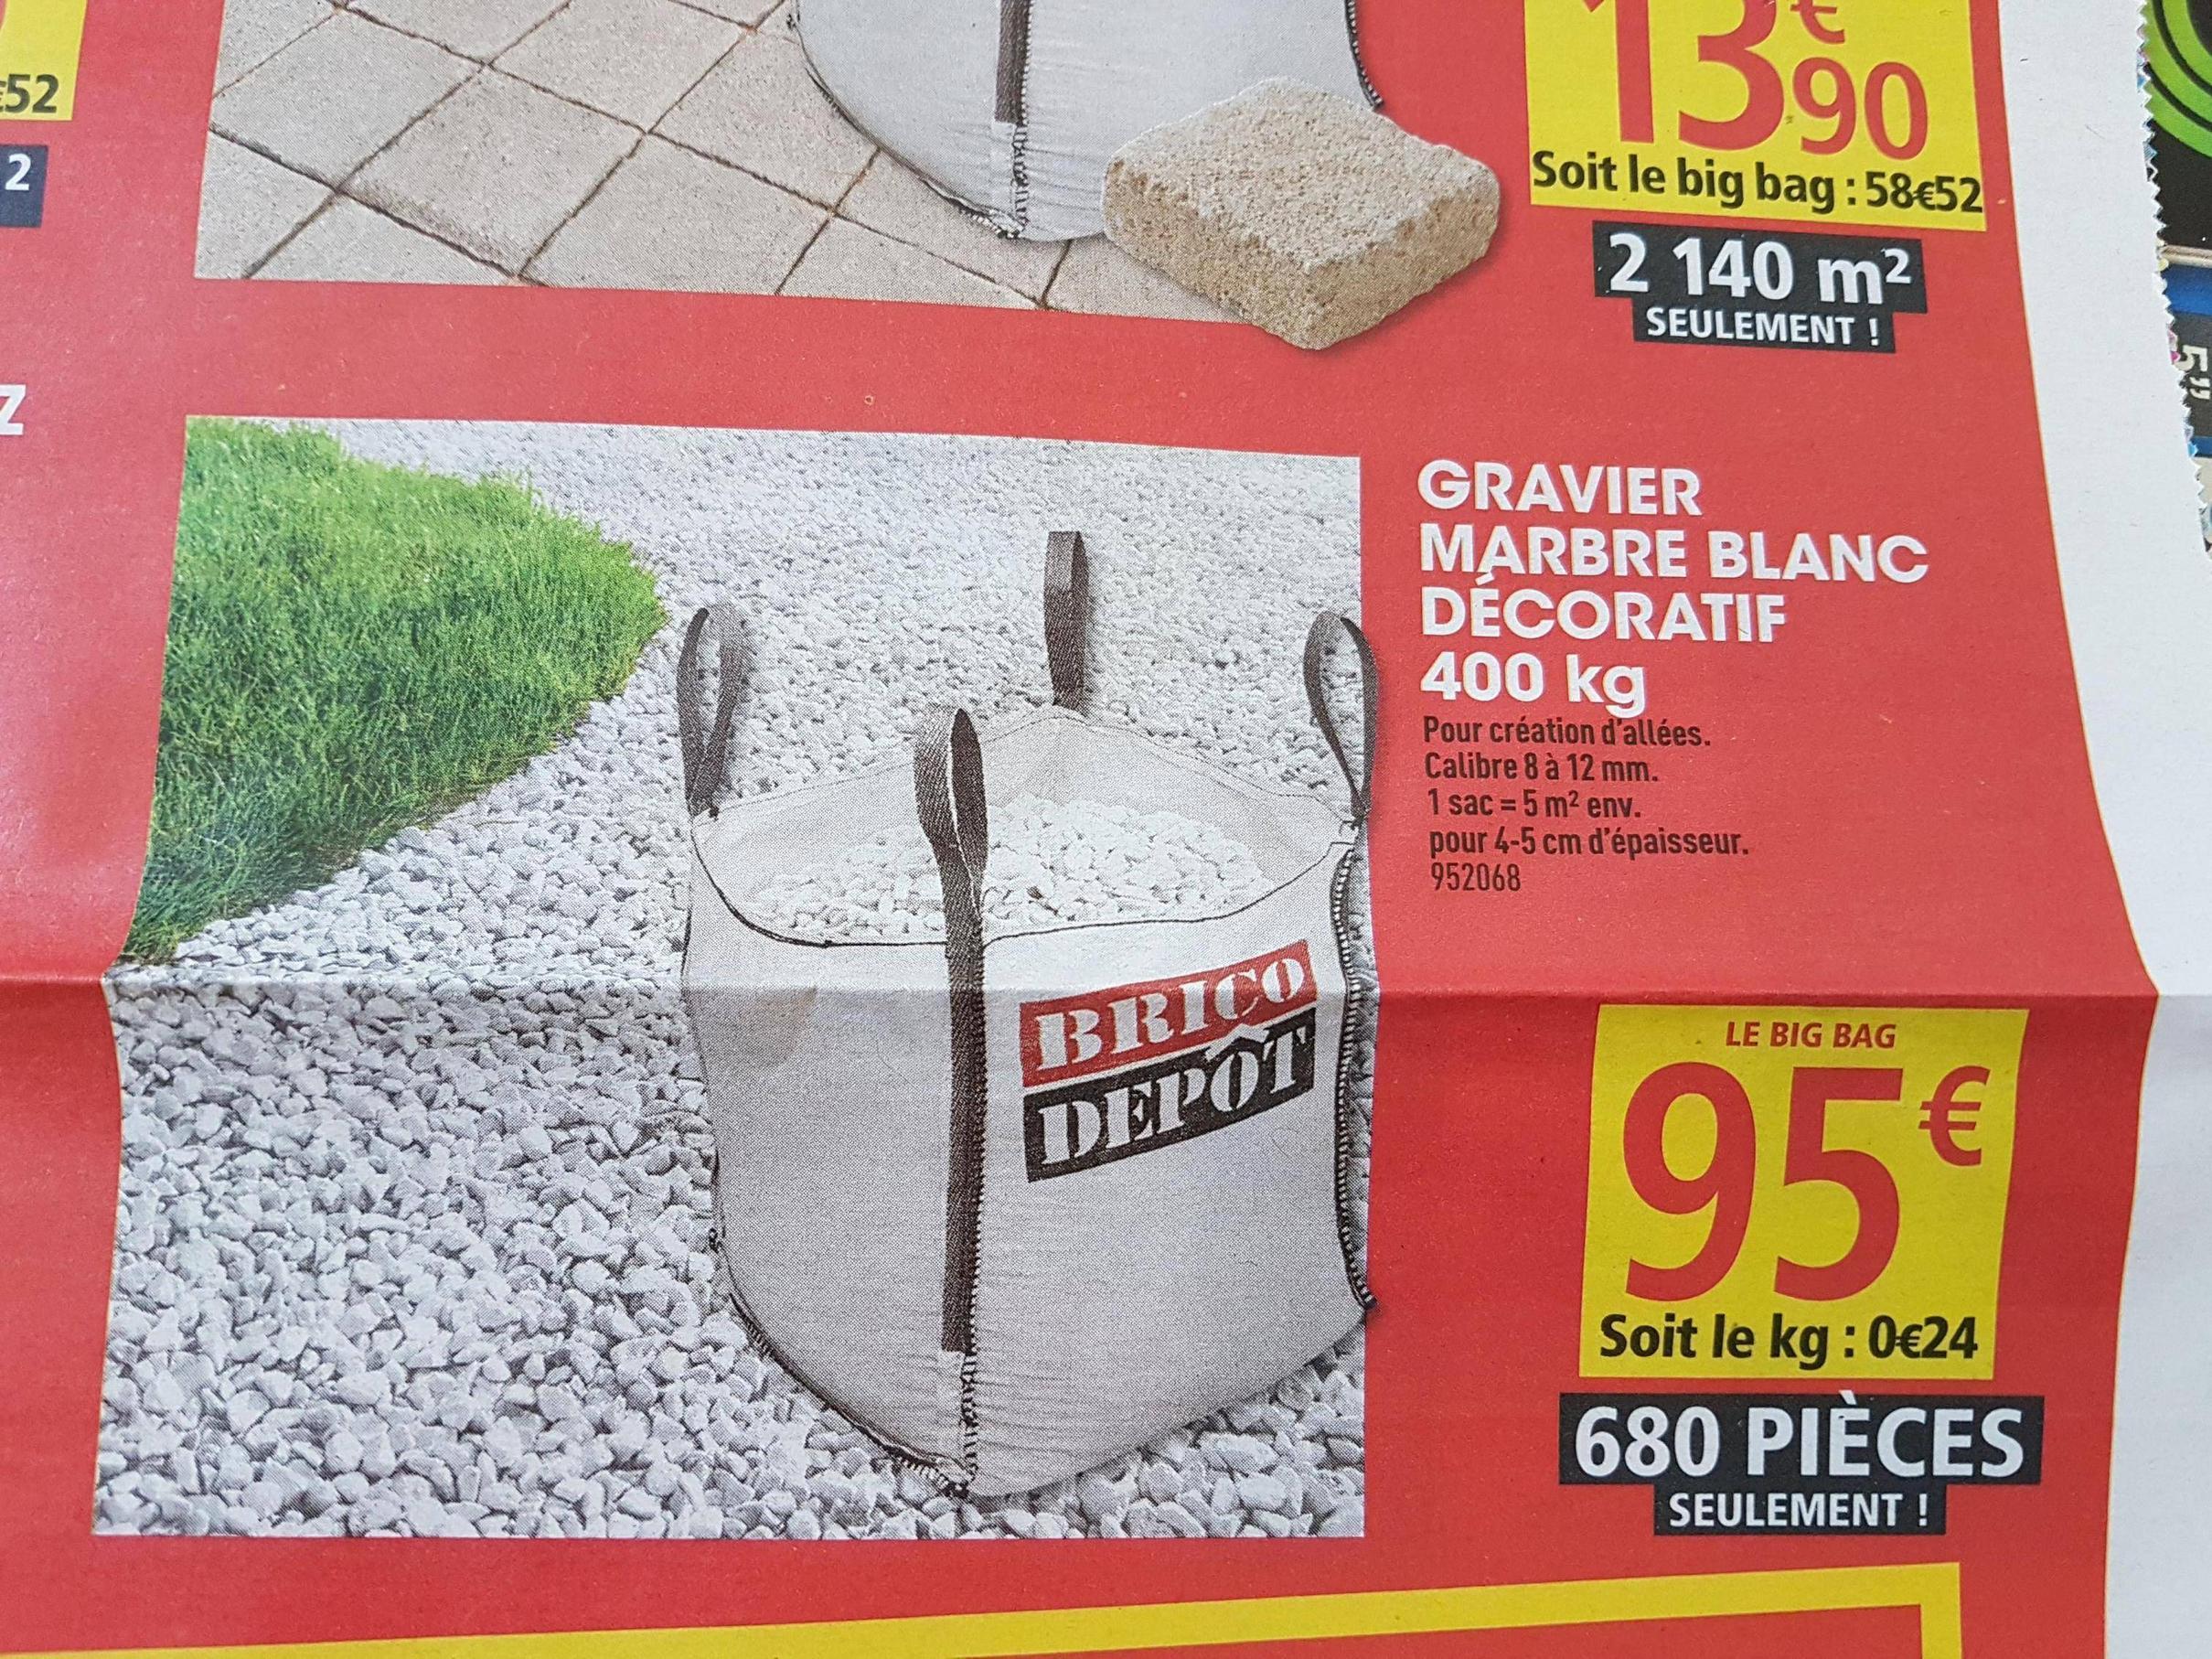 Gravier marbre blanc d coratif bigbag 400 kg for Prix gravier en vrac